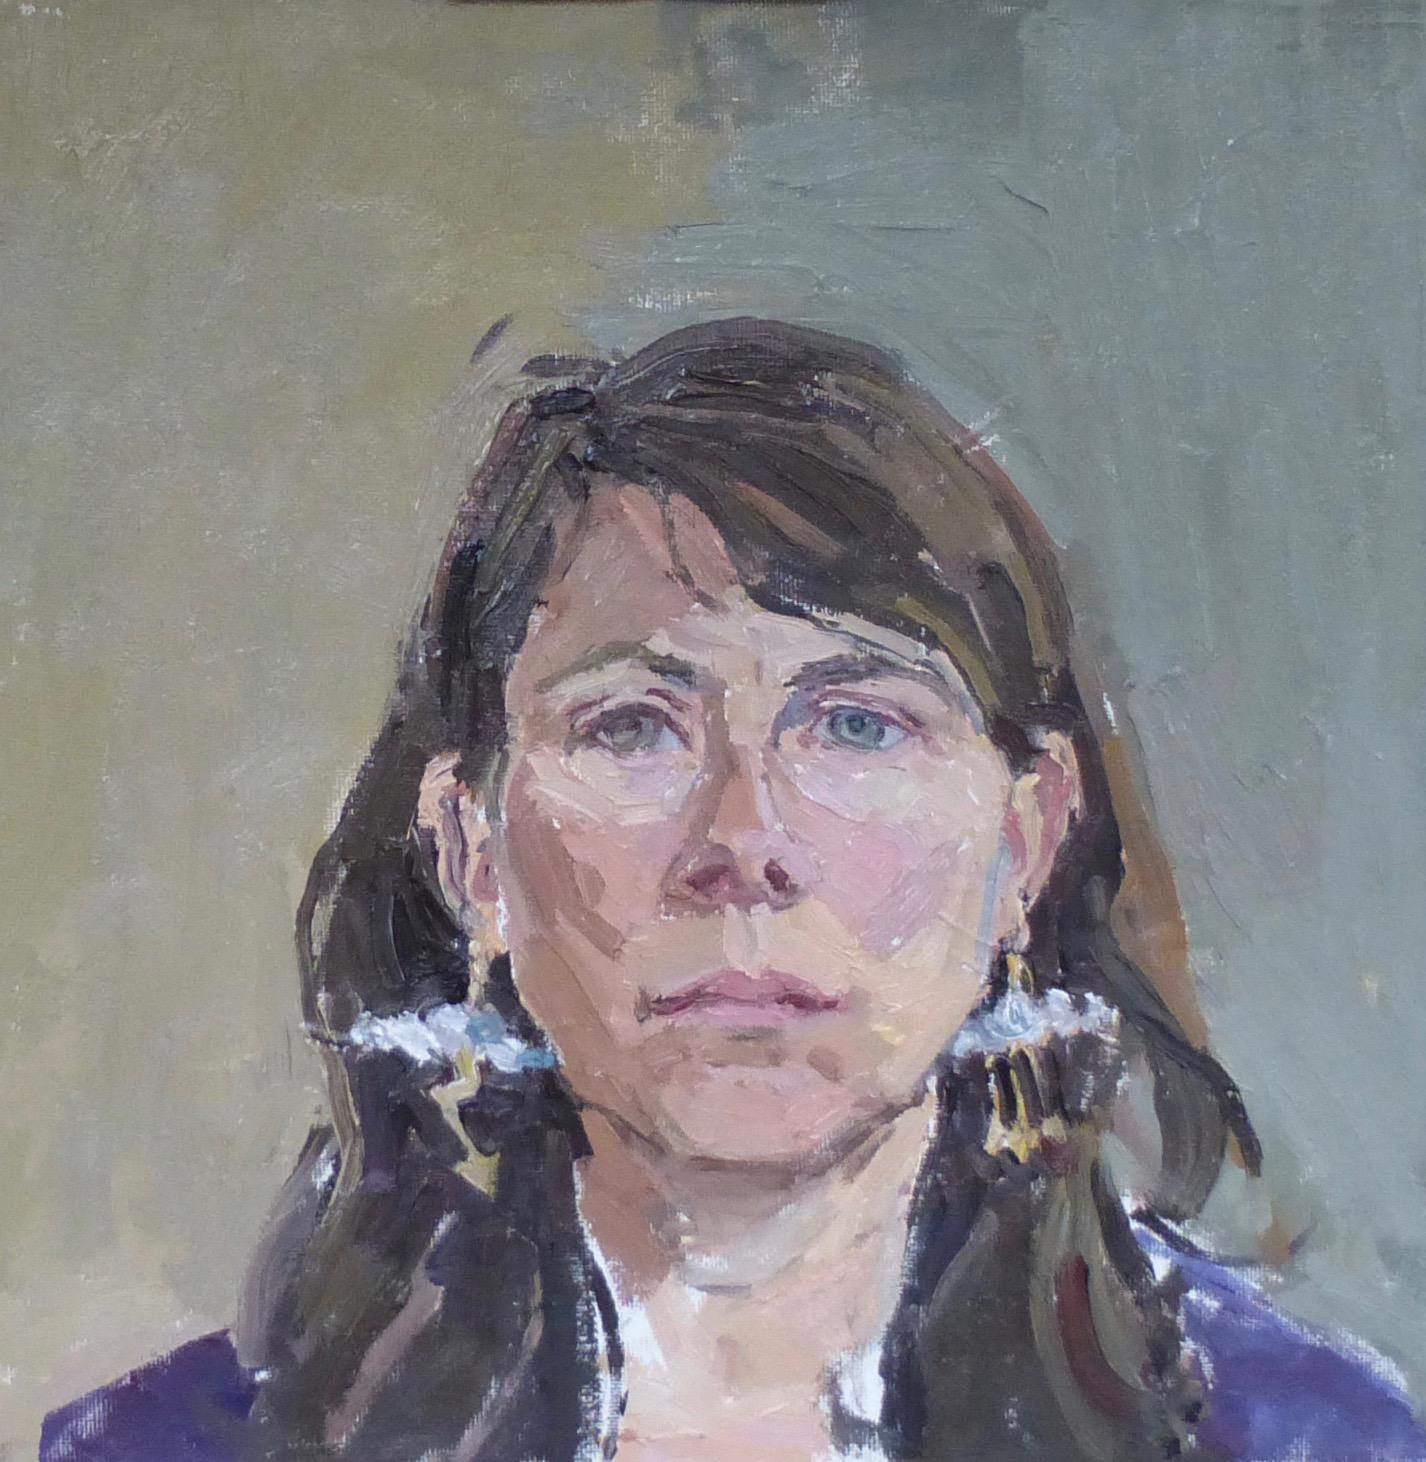 The Ruth Borchard Prize Exhibition 2017